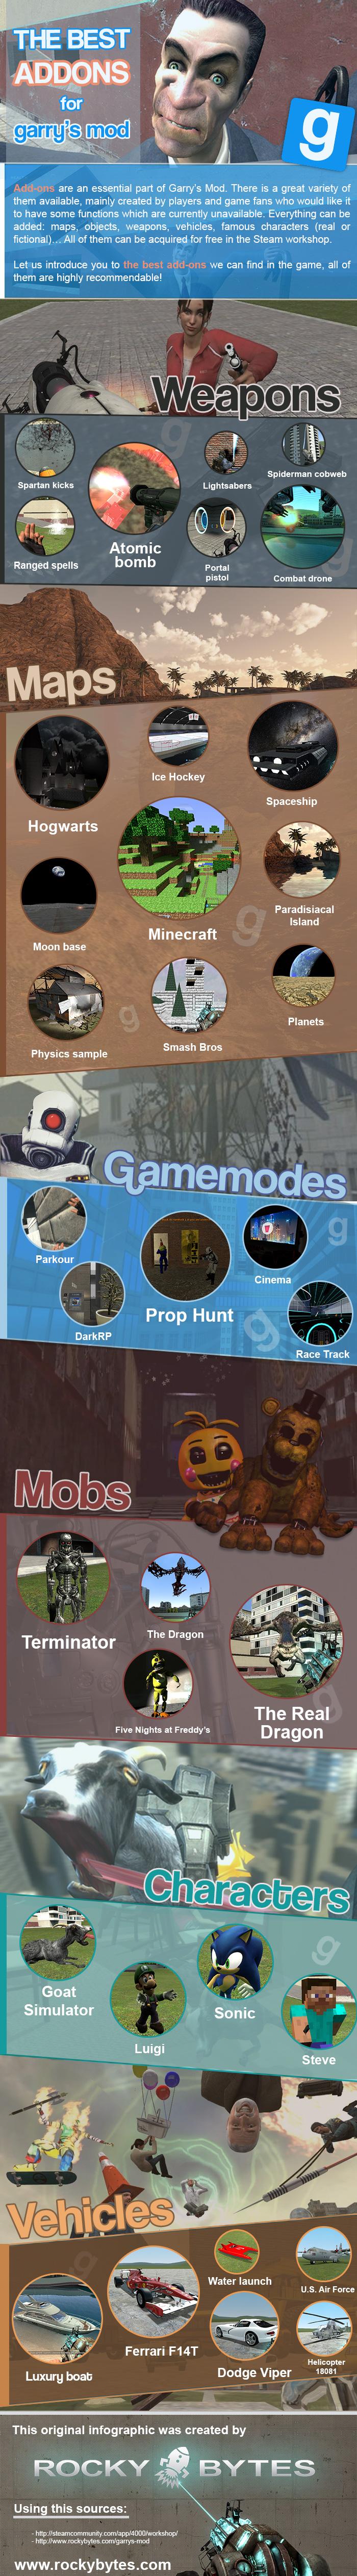 Garry's Mod Infographic Best Addons